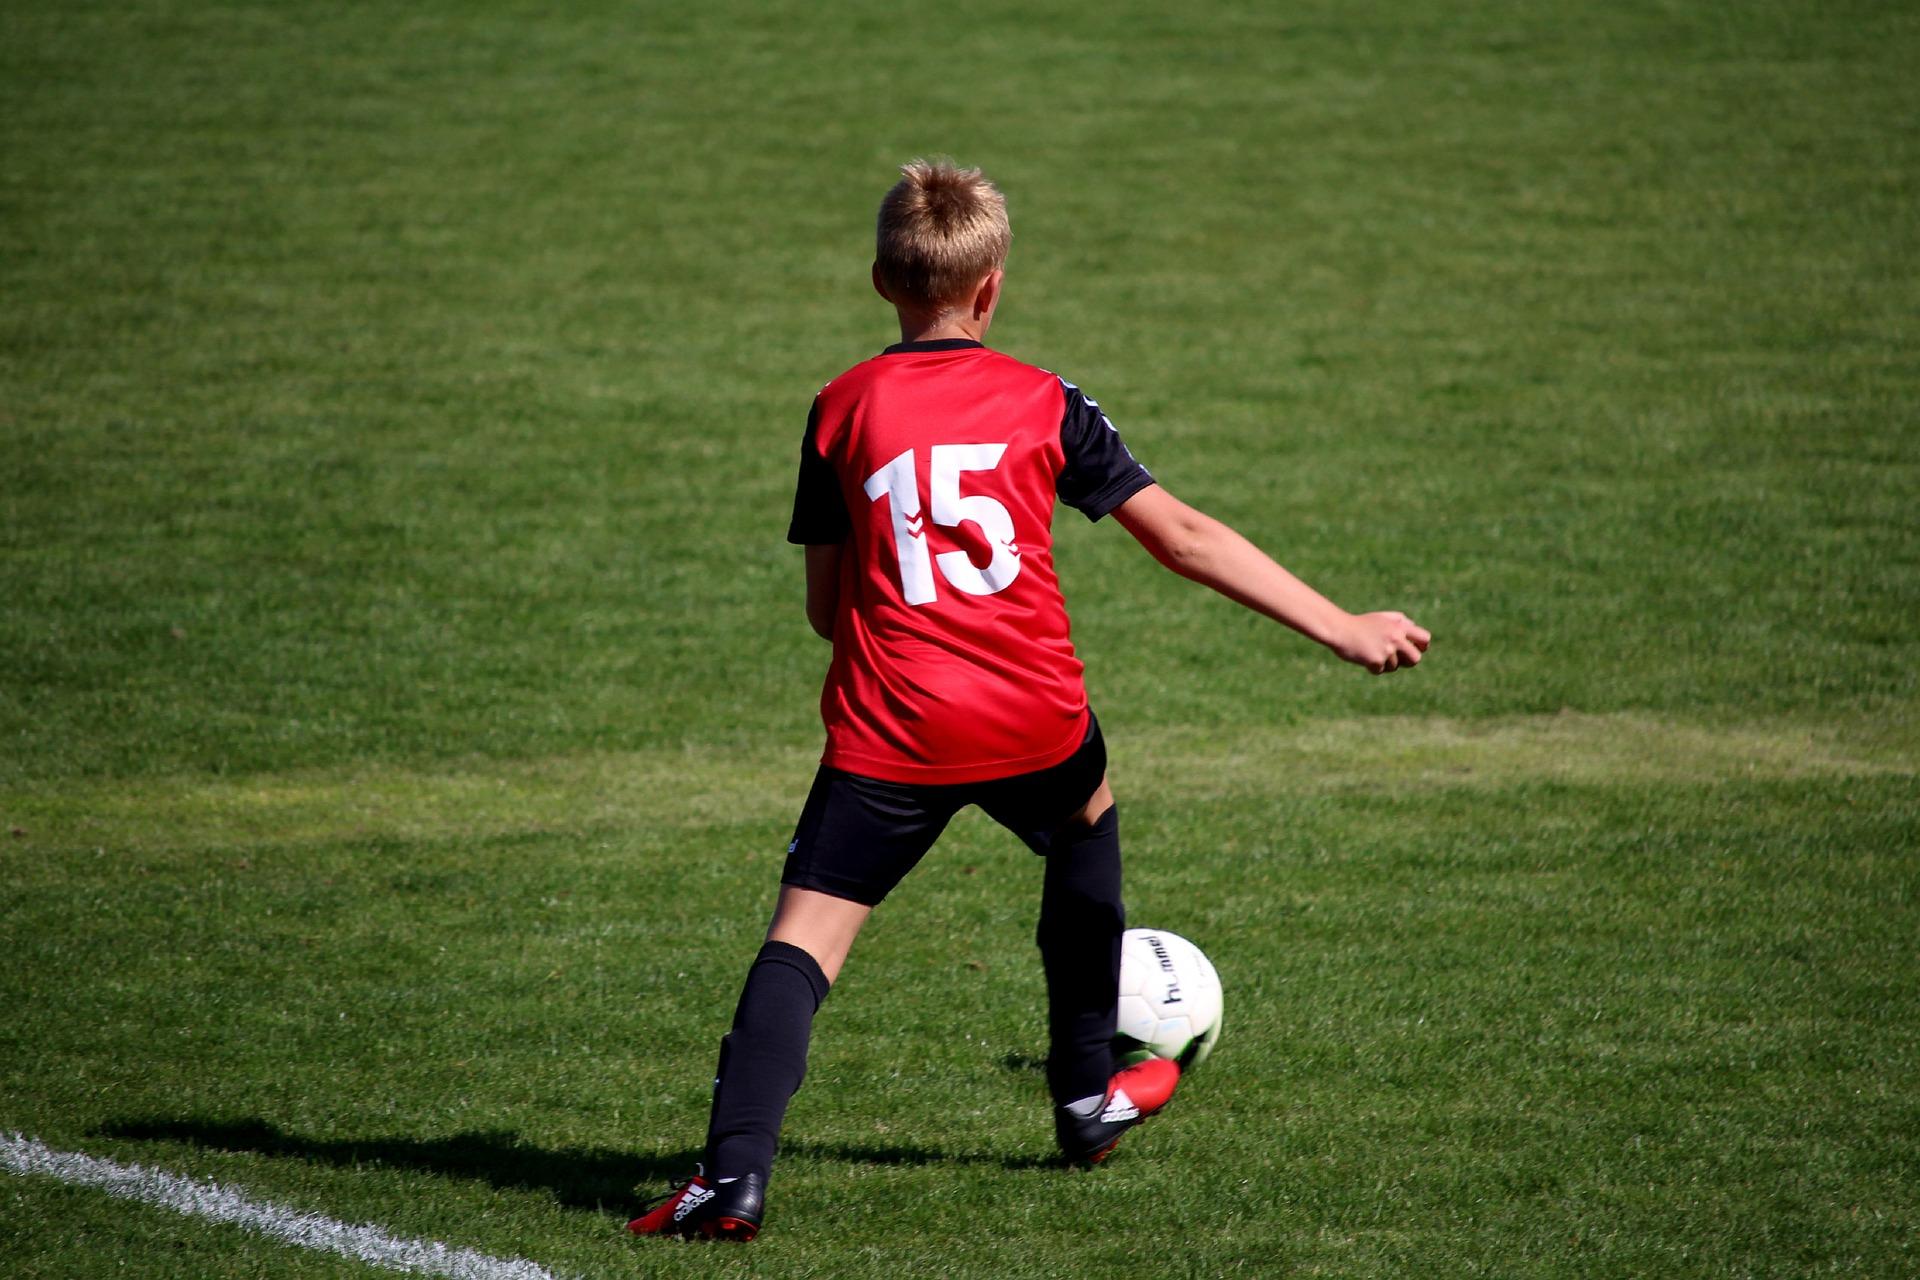 fussball die akademie infos osnarbrueck anmeldung programm training kay hoedtke